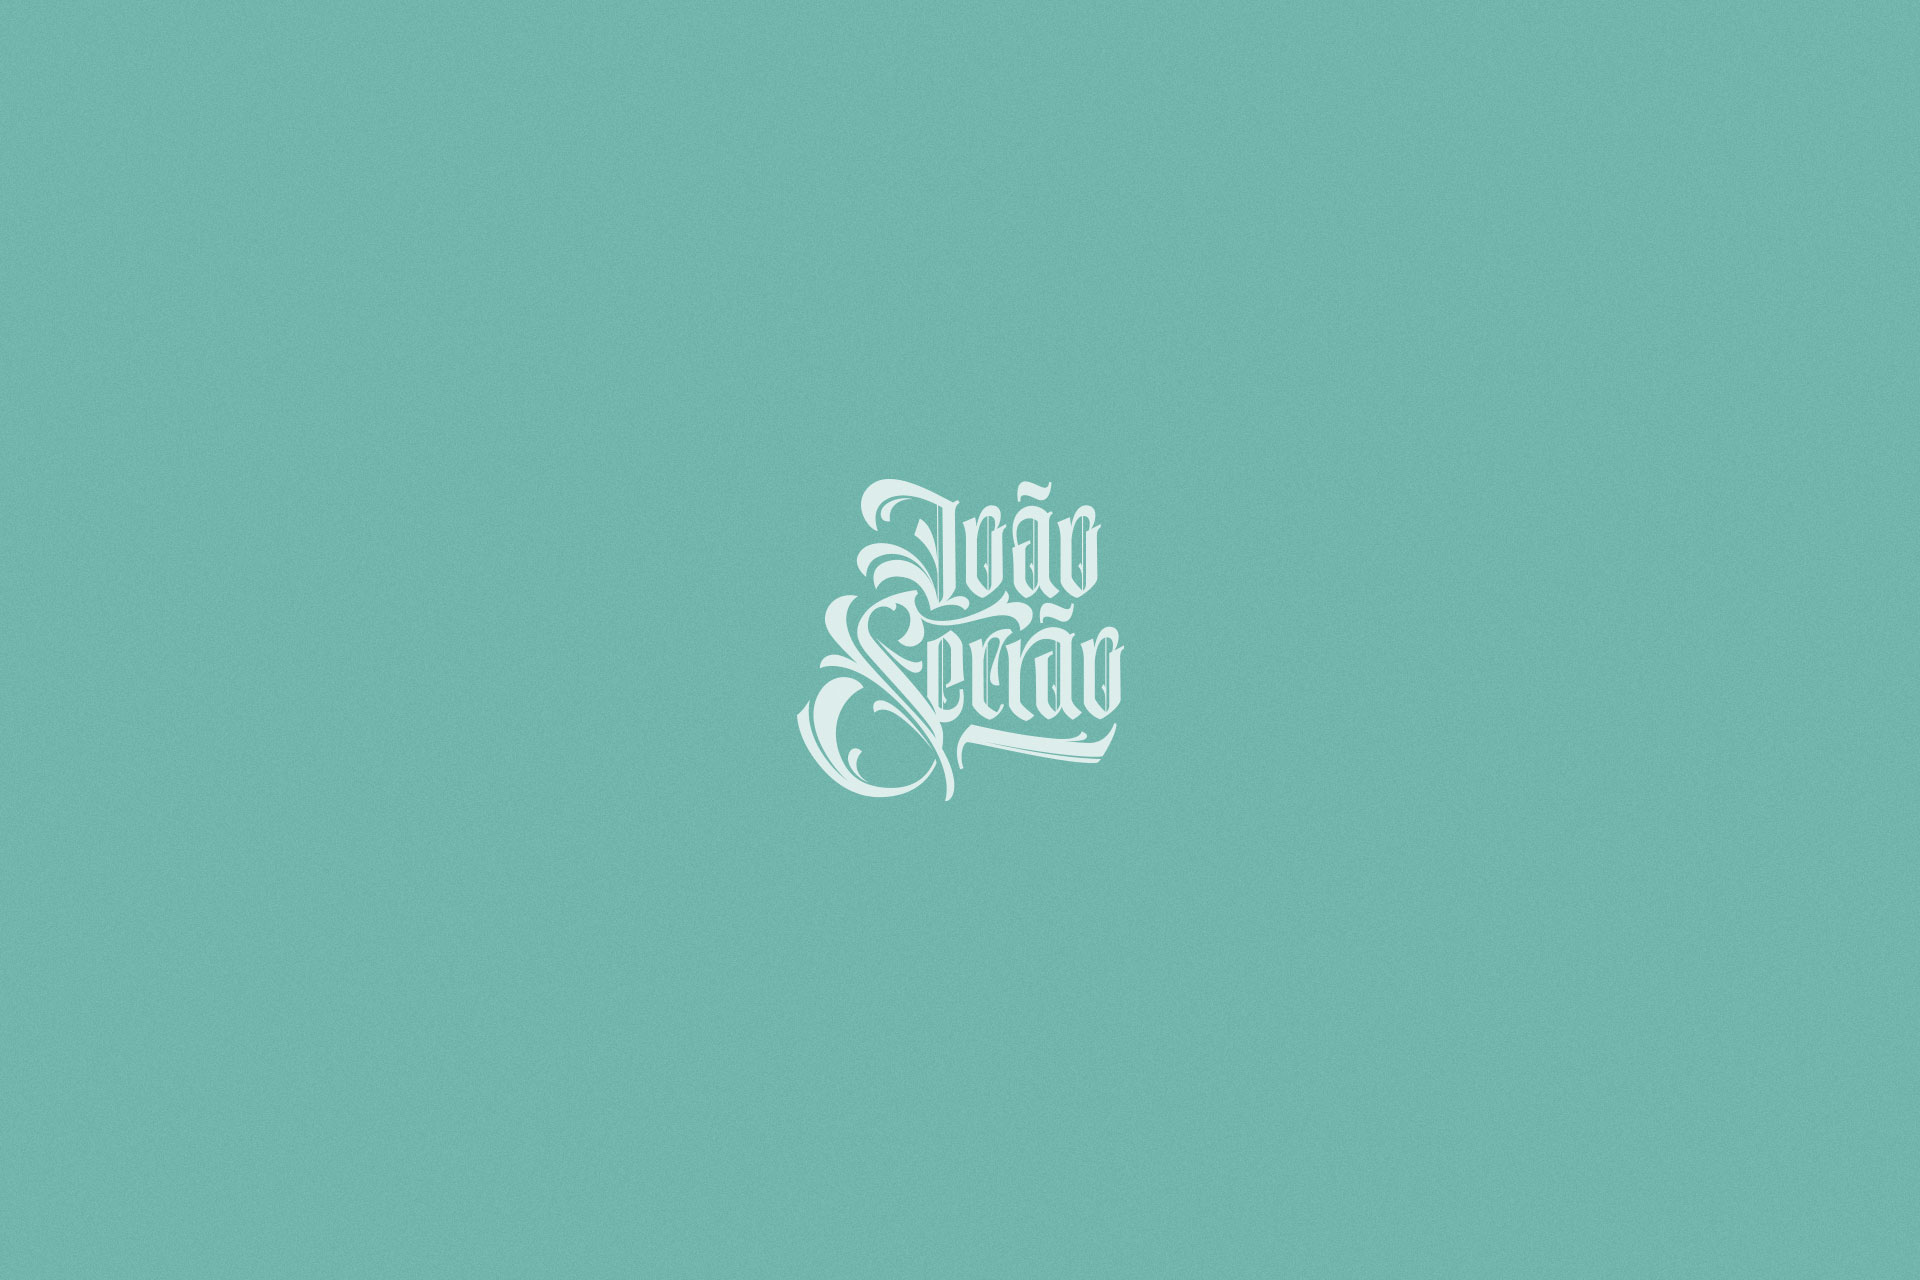 Logos & Brandmarks Joao Serrao